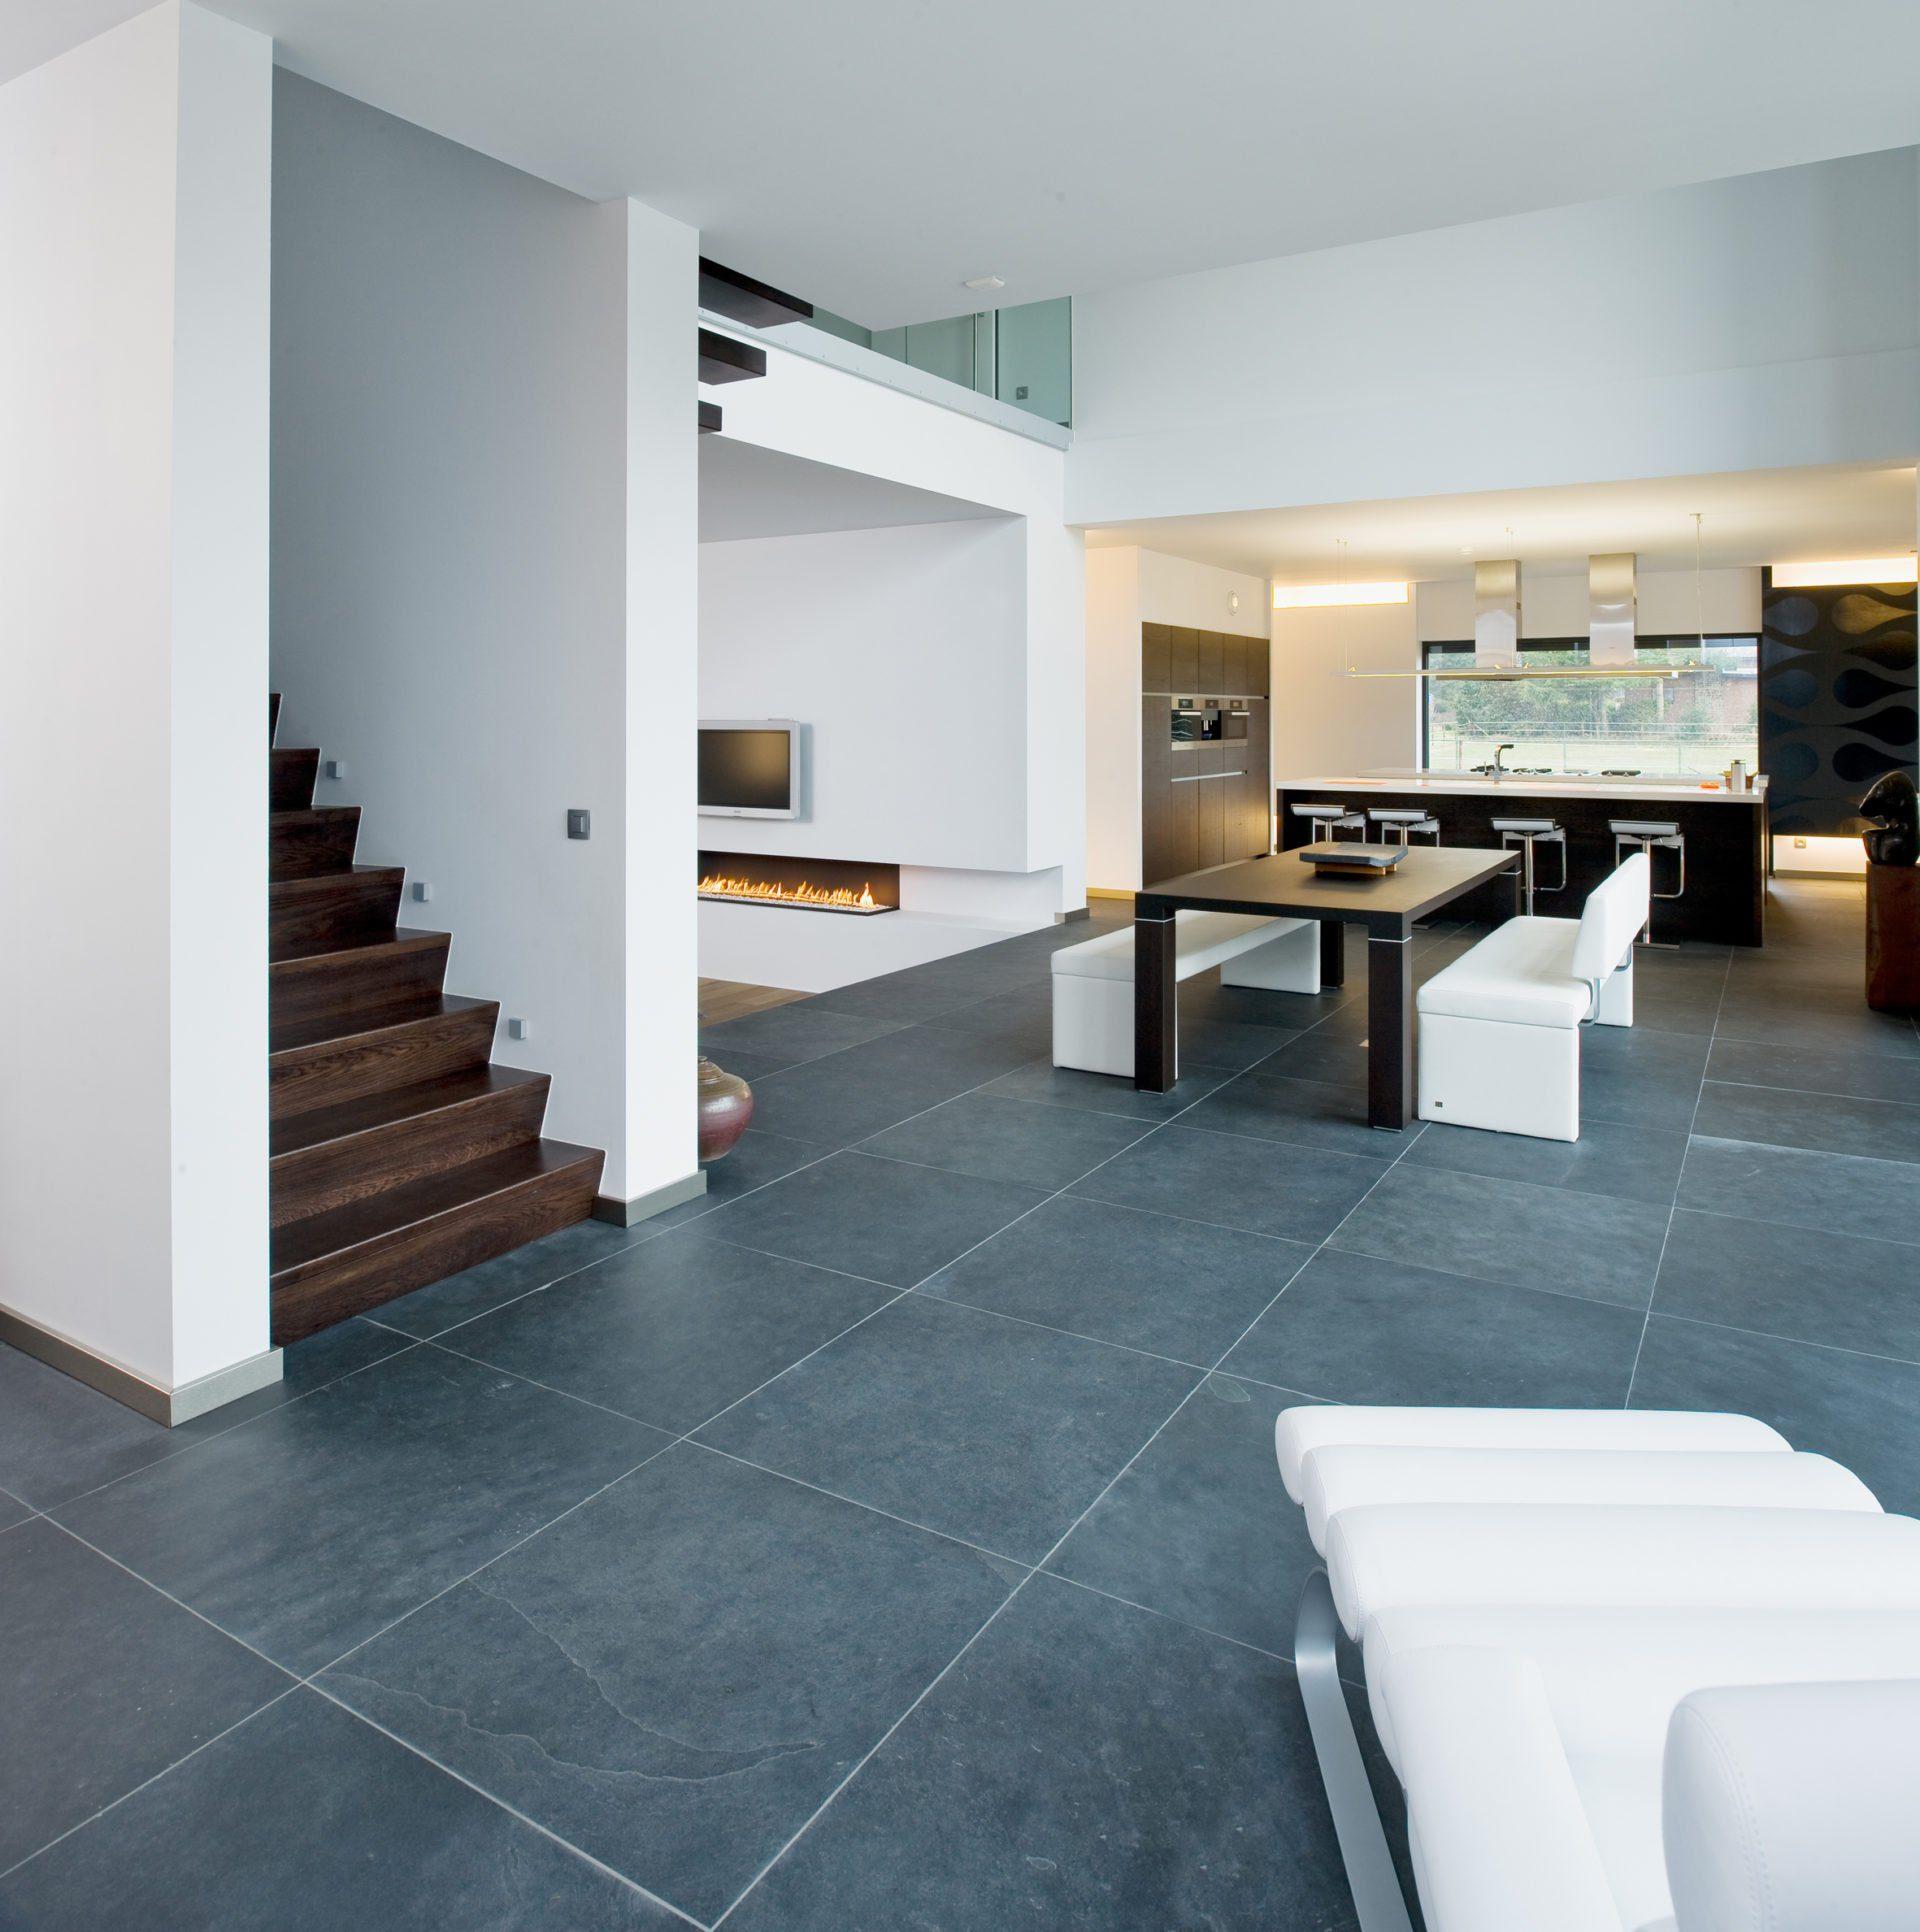 Leisteen vloer prachtige leistenen tegels kroon vloeren Trap in woonkamer